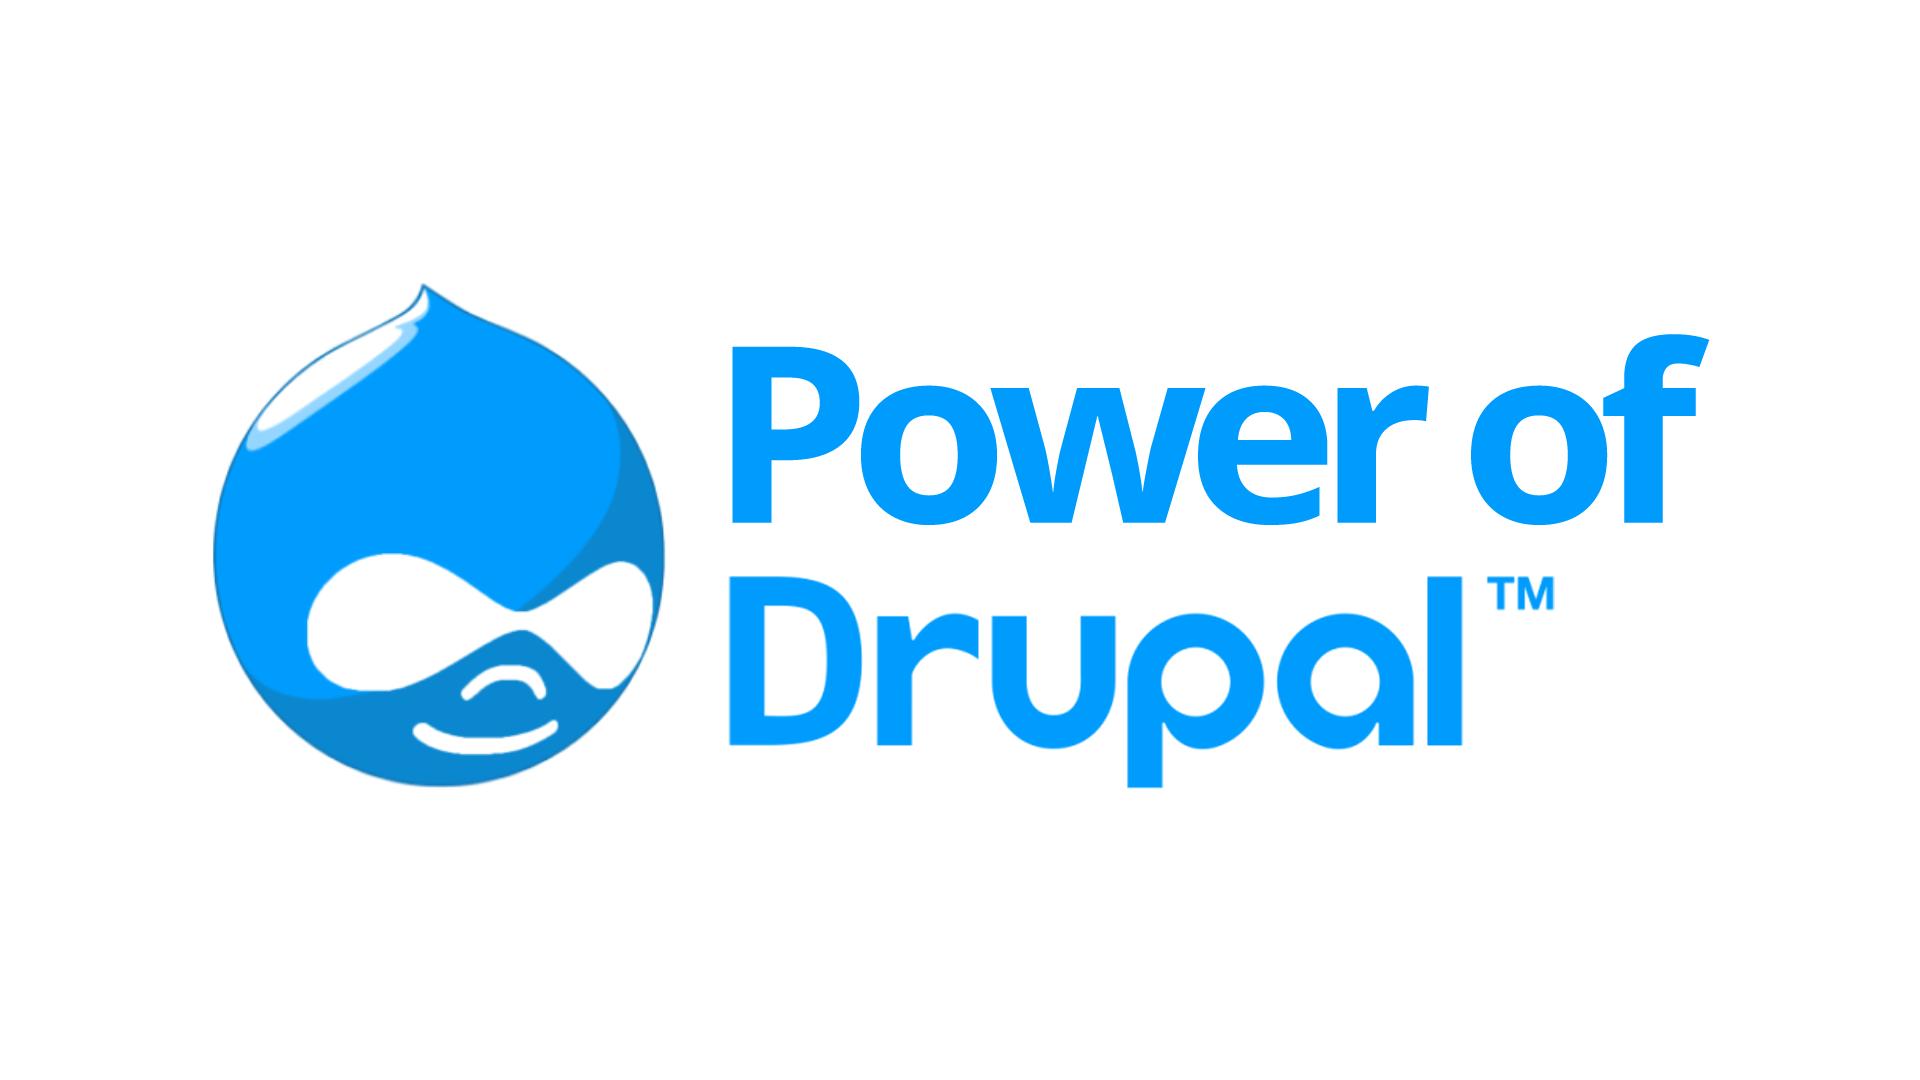 Open source drupal groups power of drupal finally in english xflitez Gallery